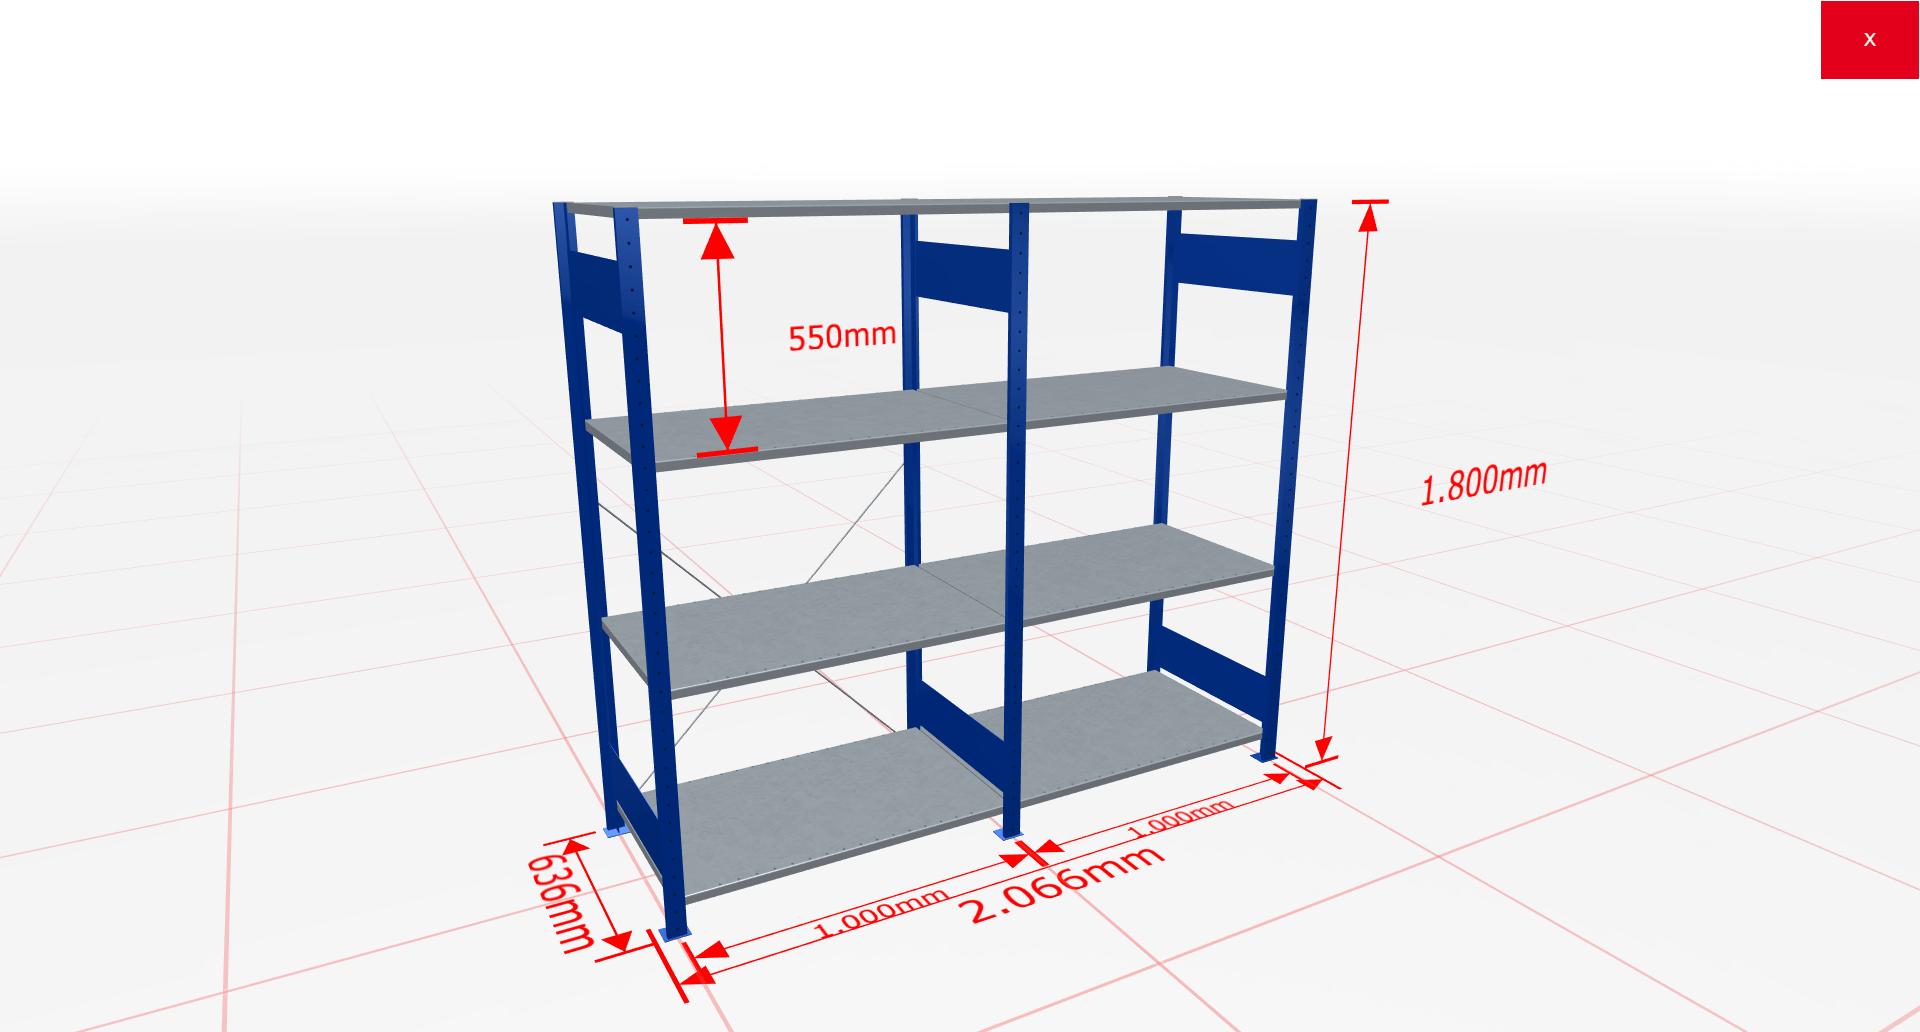 Fachbodenregal Komplettregal 1800x2066x600 mm (HxBxT) SCHULTE Lagertechnik blau 4 Ebenen  150 kg je Boden